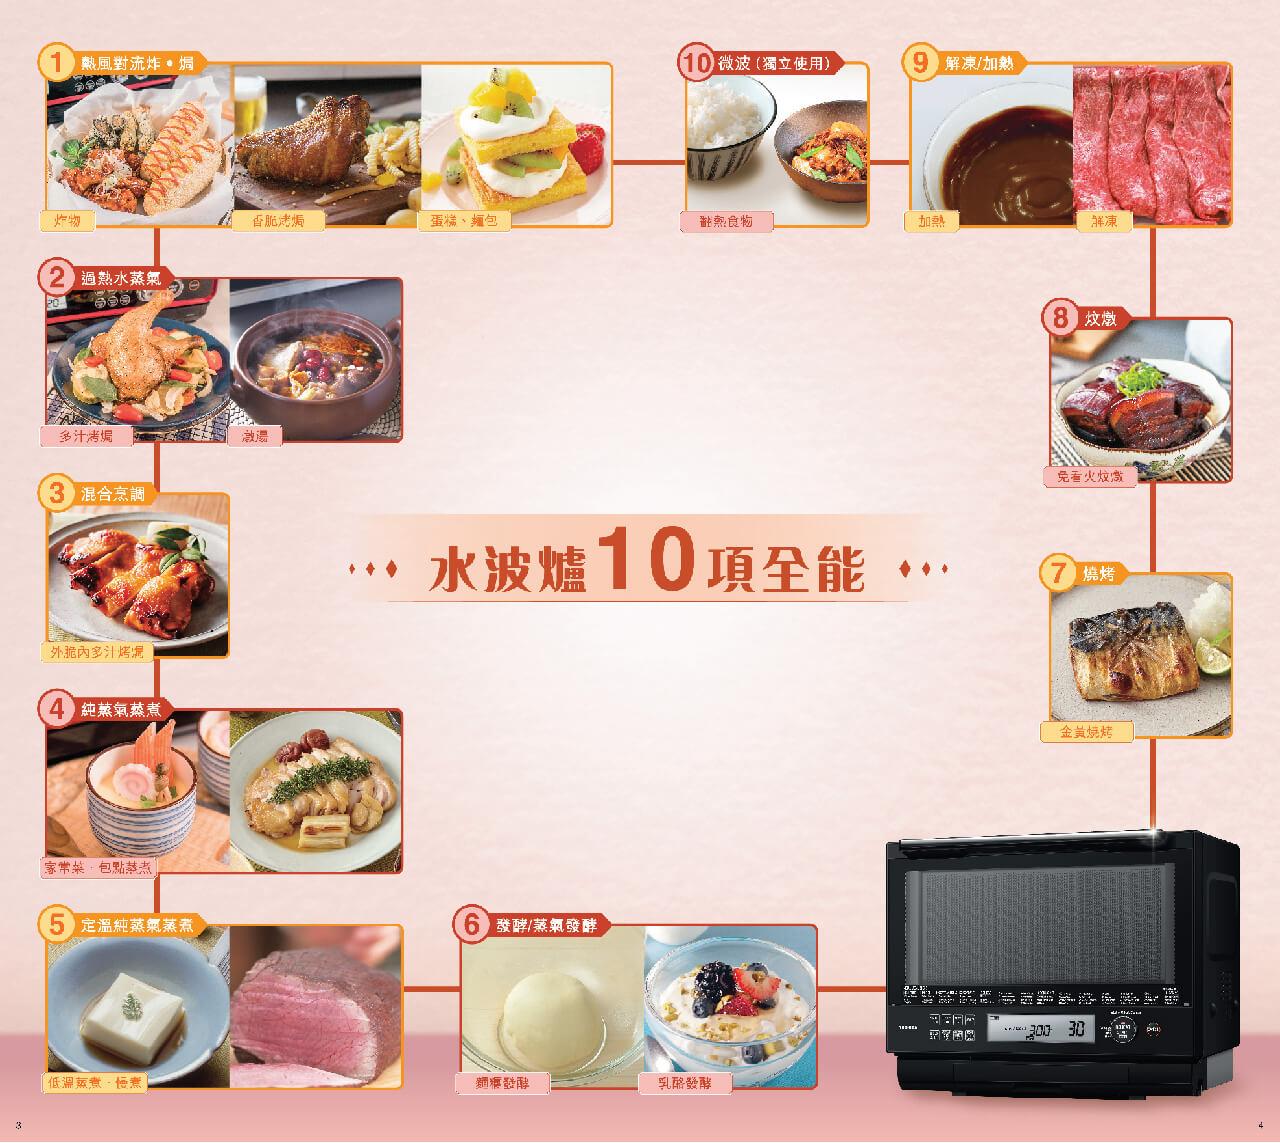 Toshiba 東芝 ER-TD5000HK 30公升 座檯式純蒸氣烤焗水波爐